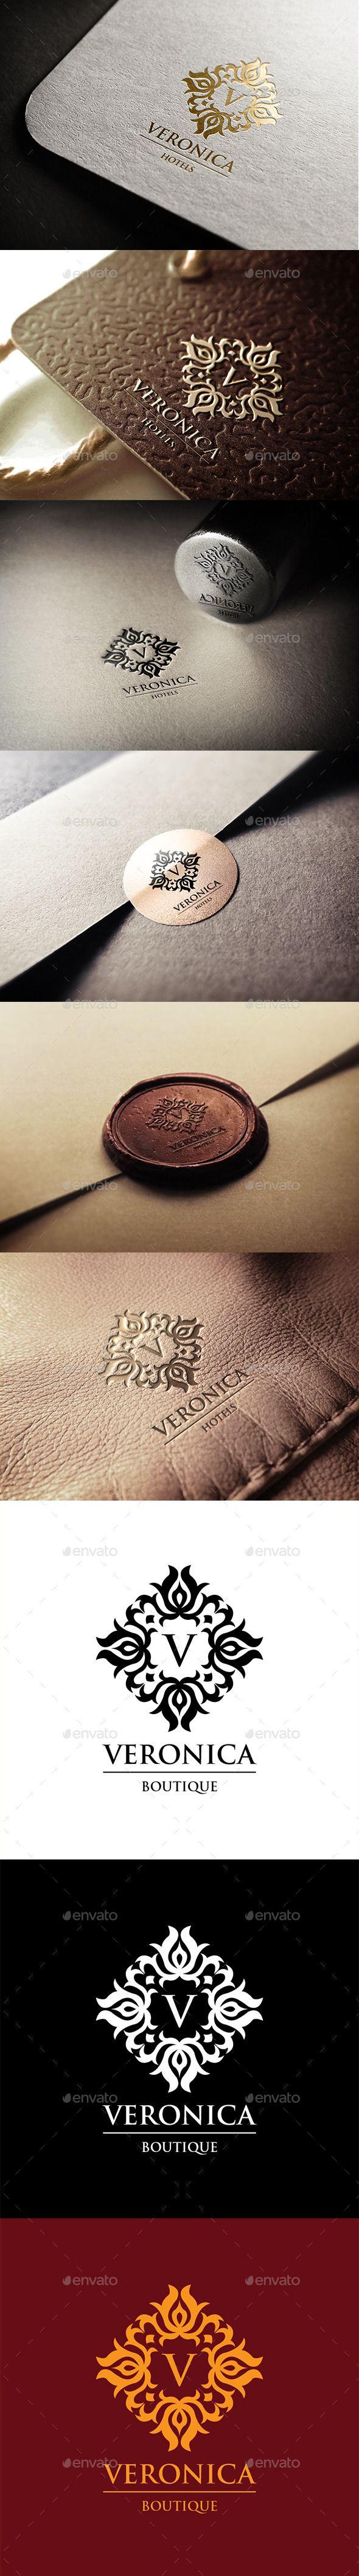 Veronica Hotels Logo Template #design #logotype Download: http://graphicriver.net/item/veronica-hotels-logo/11256338?ref=ksioks